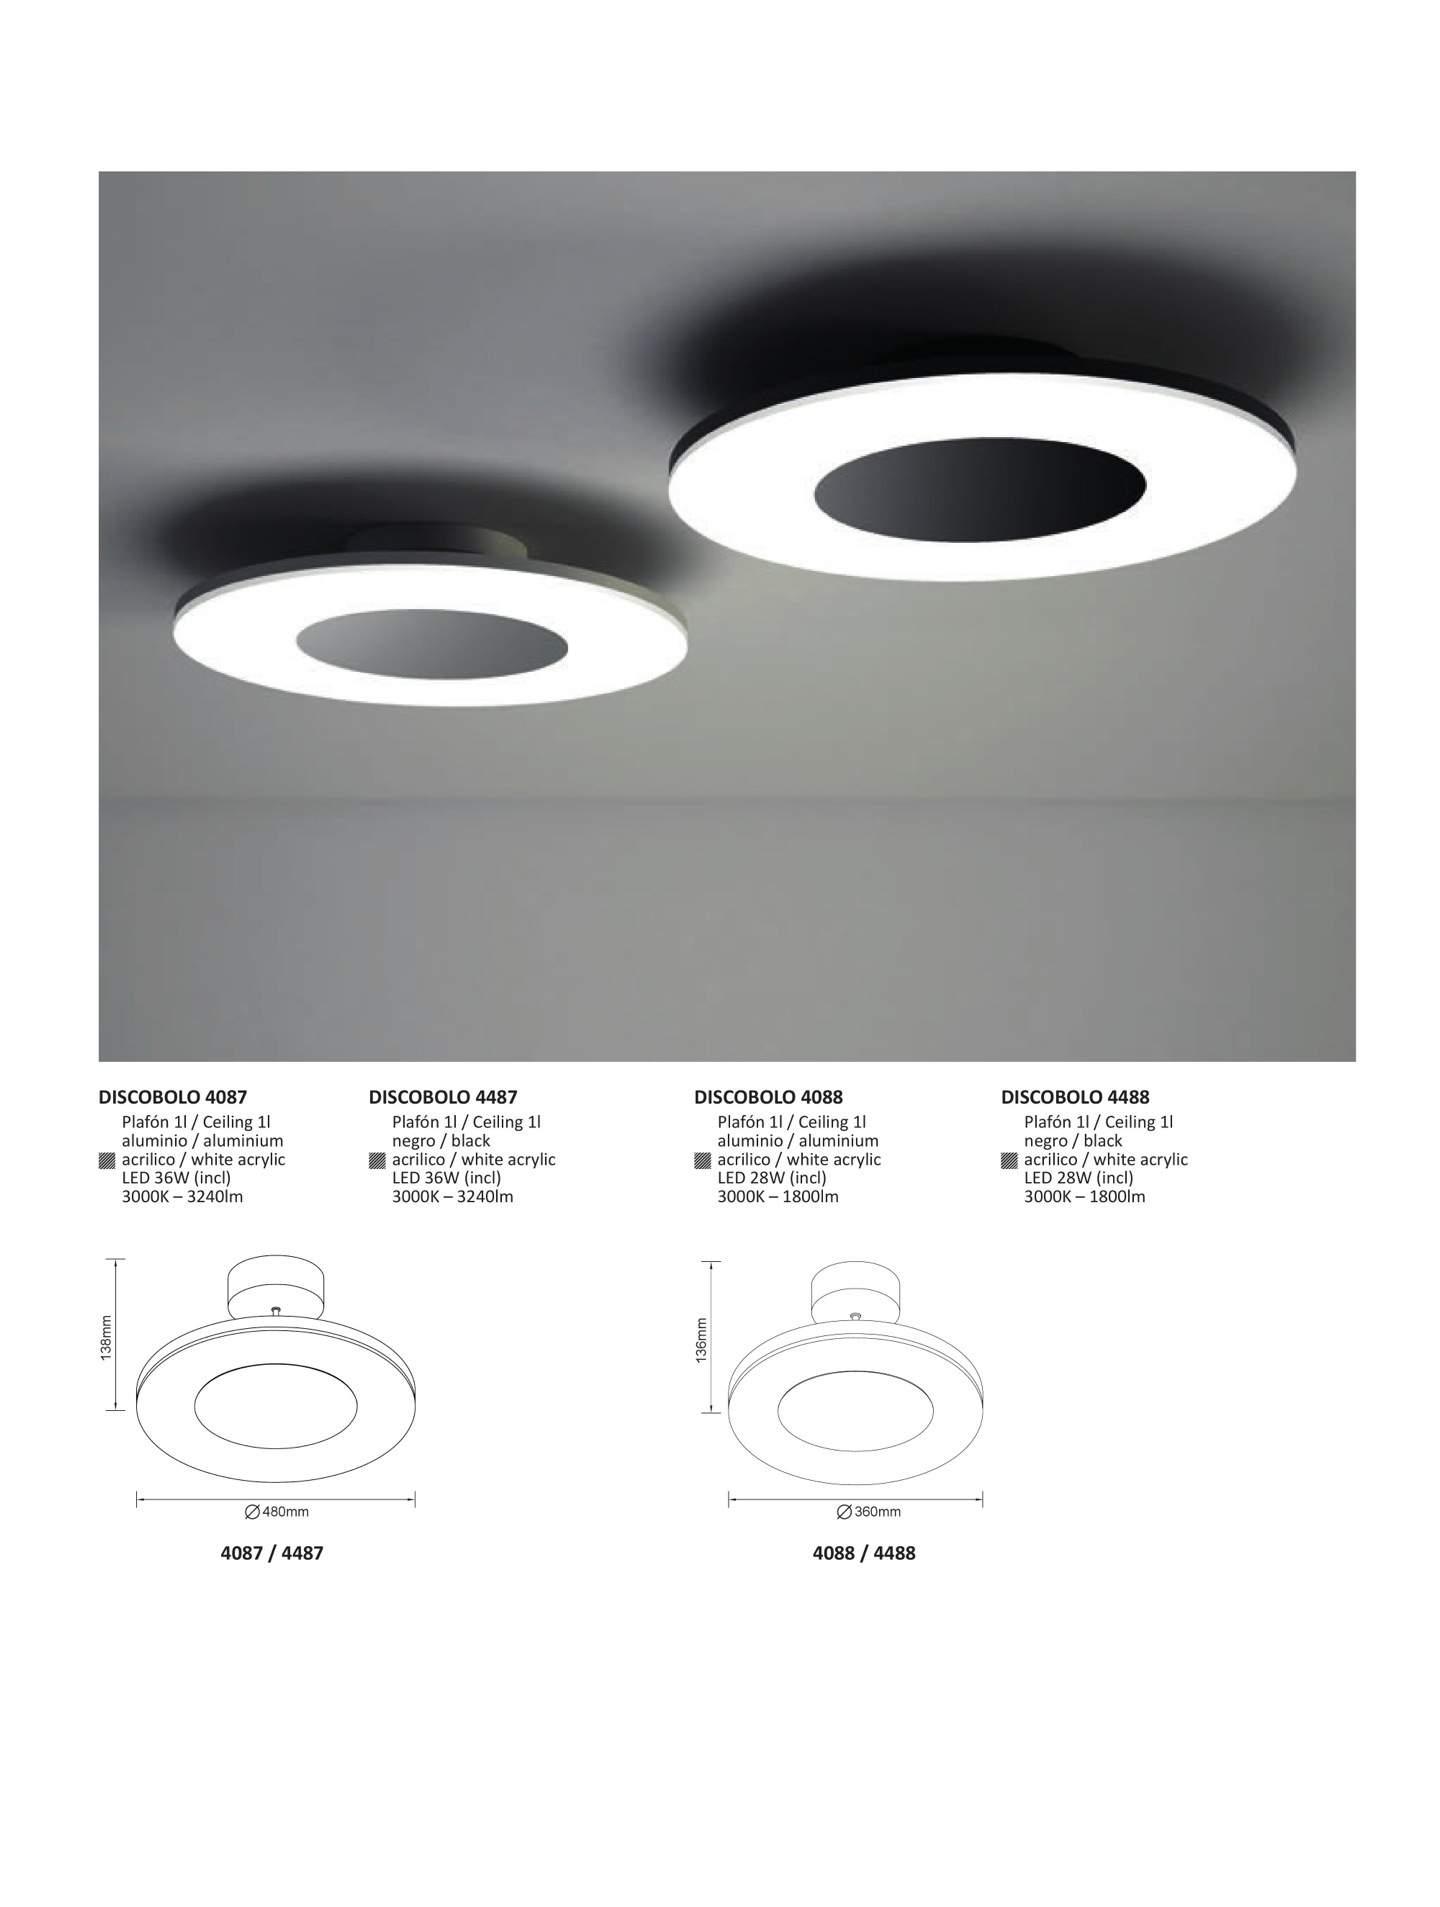 Mantra discobolo ceiling lamp circular 48cm led 4487 - Plafones de techo led ...